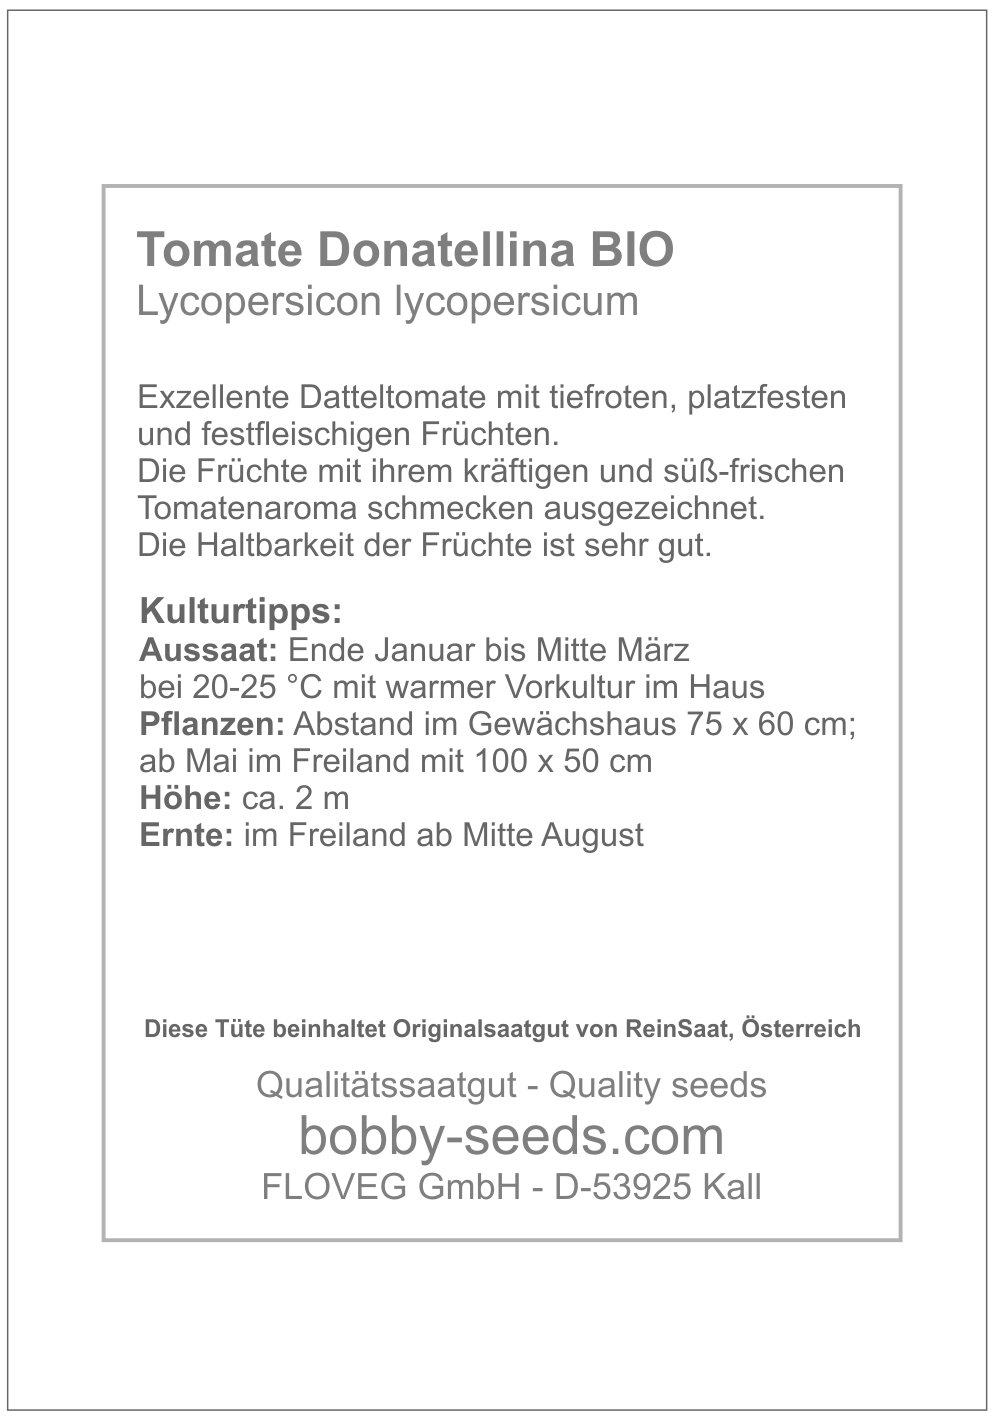 Bobby-Seeds BIO-Tomatensamen Donatellina Portion